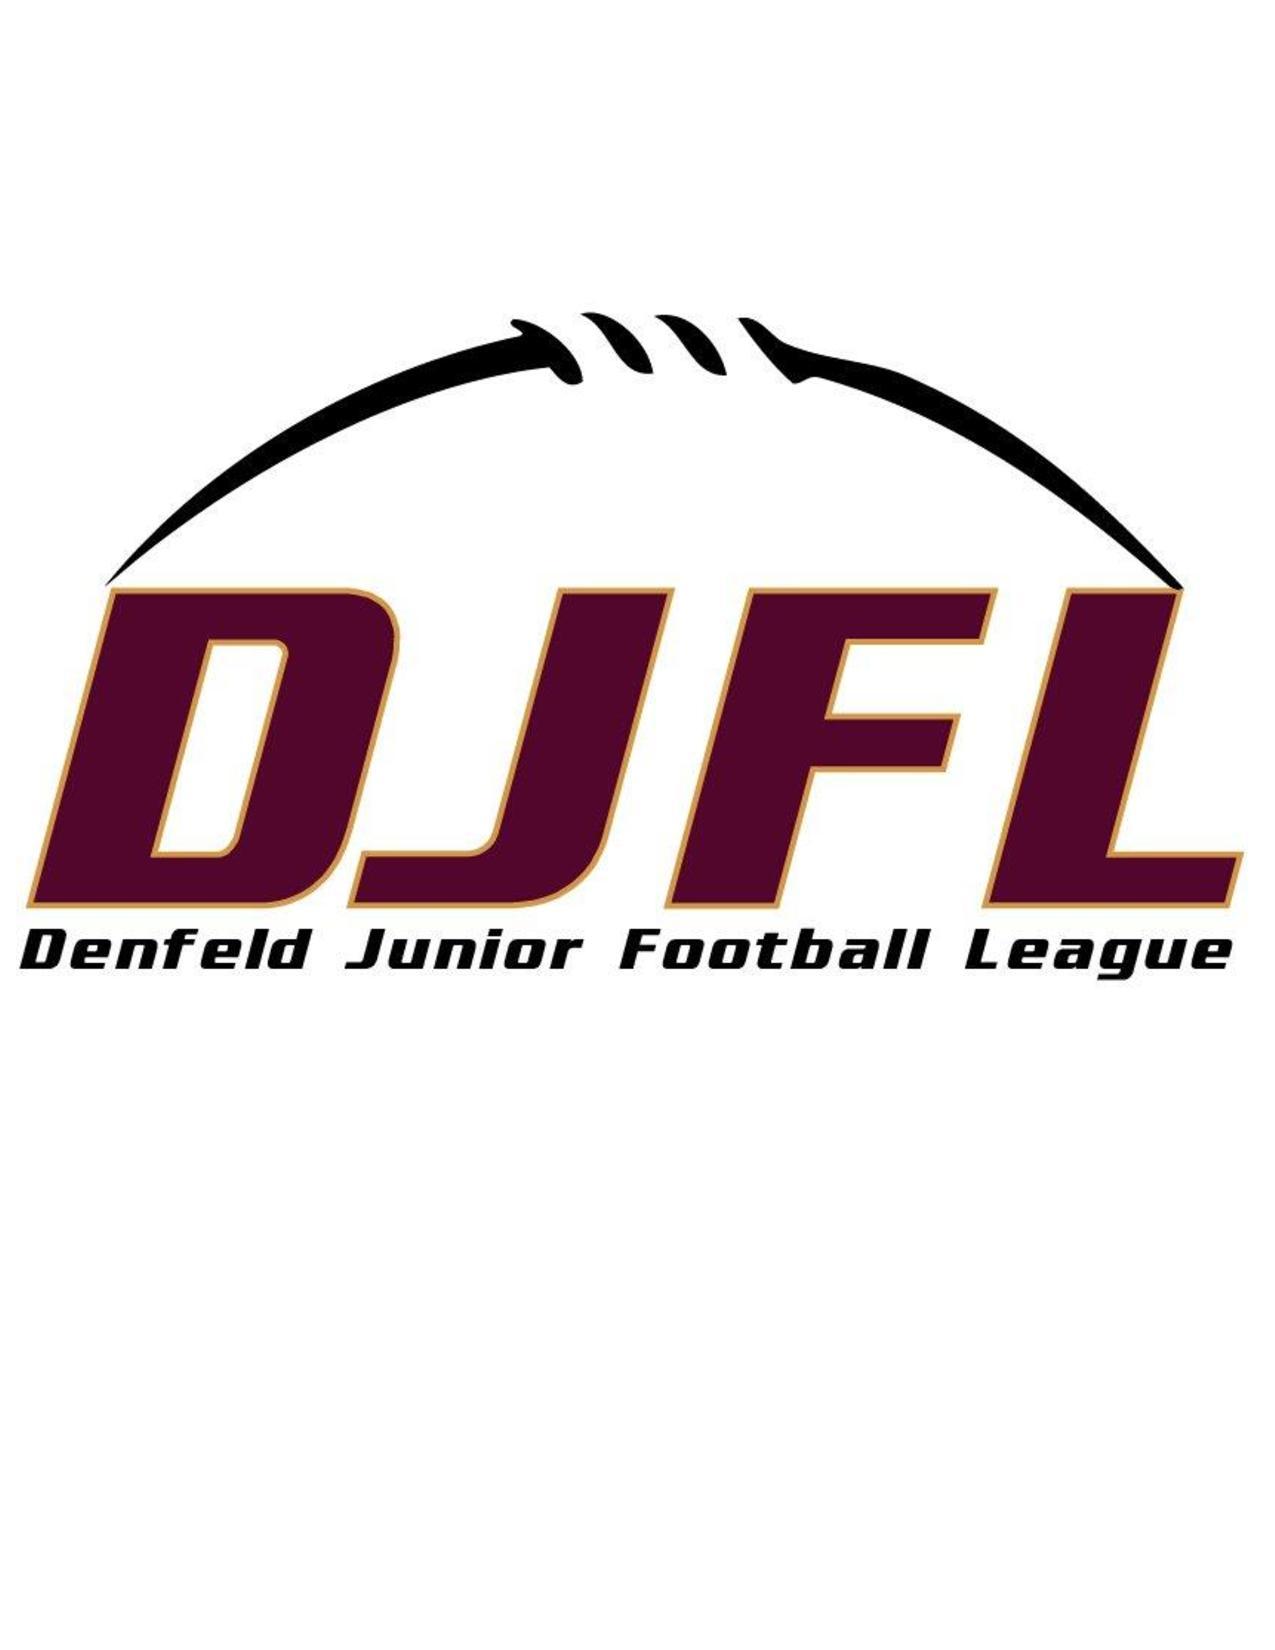 Denfeld Junior Football League